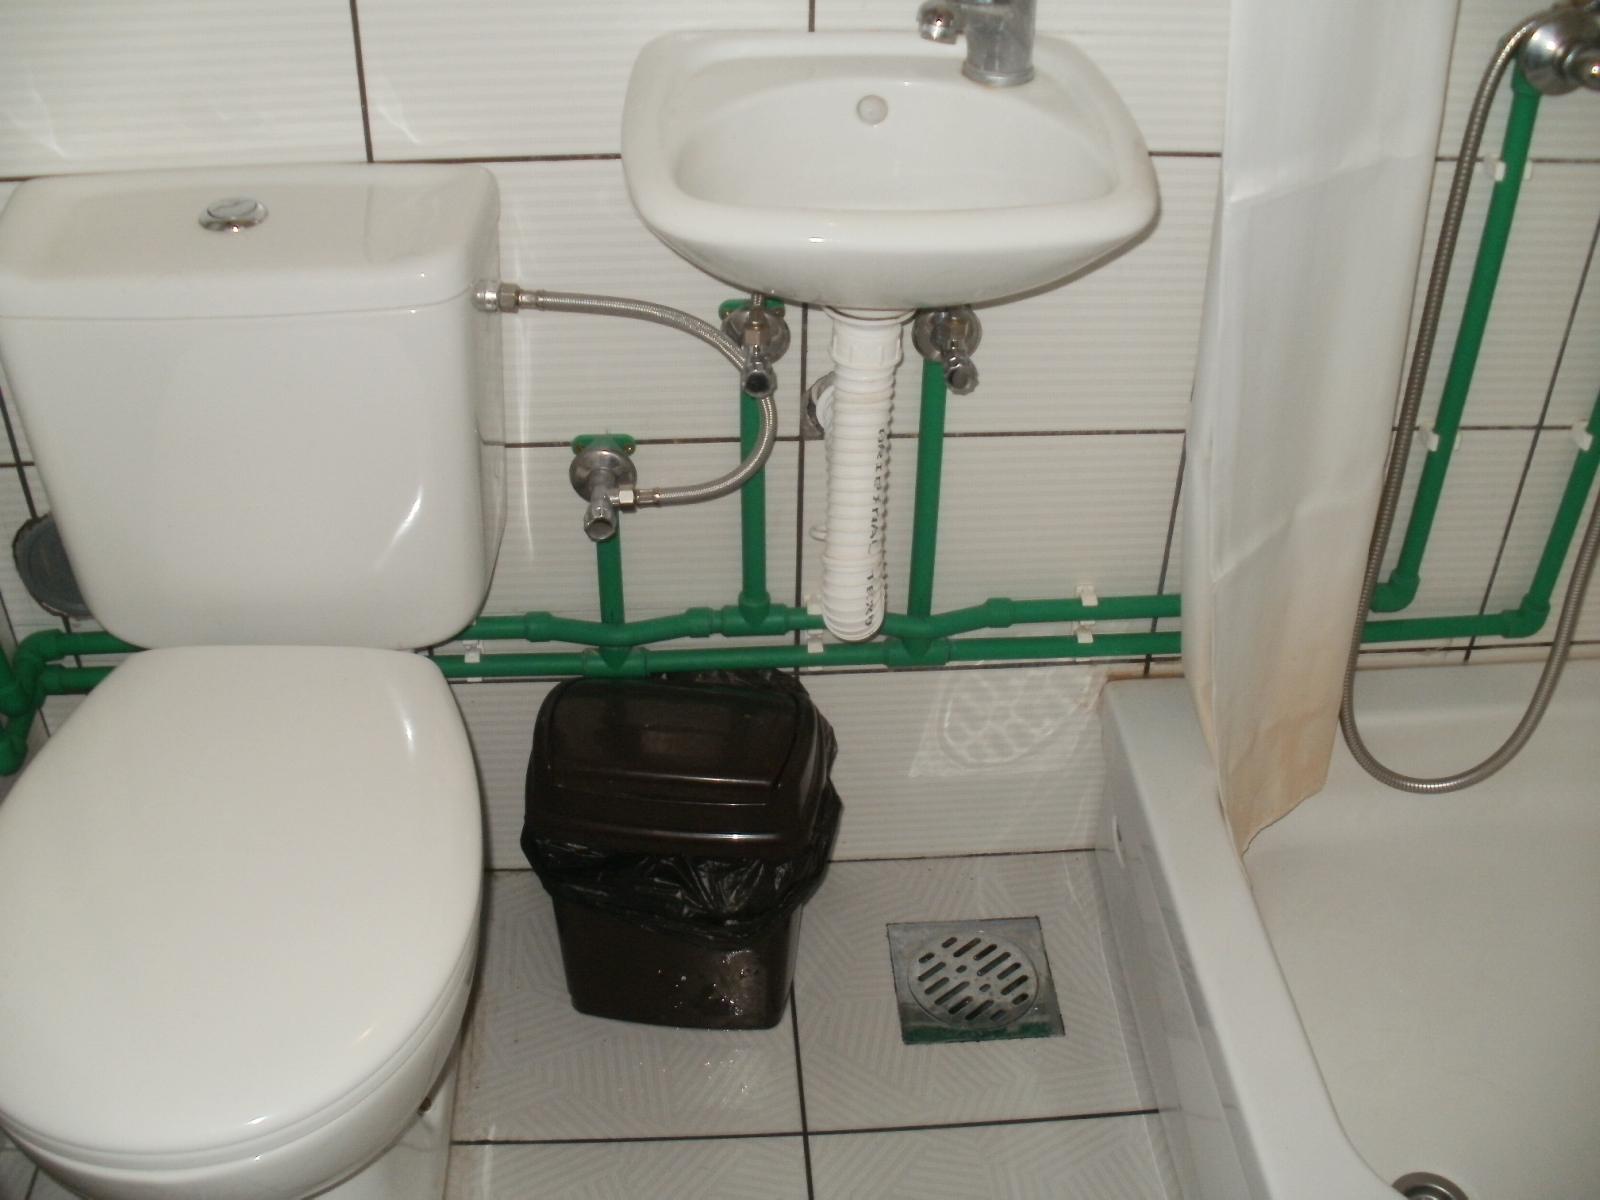 14_Toalet_u_sobama_1_do_8.JPG - 468,76 kB